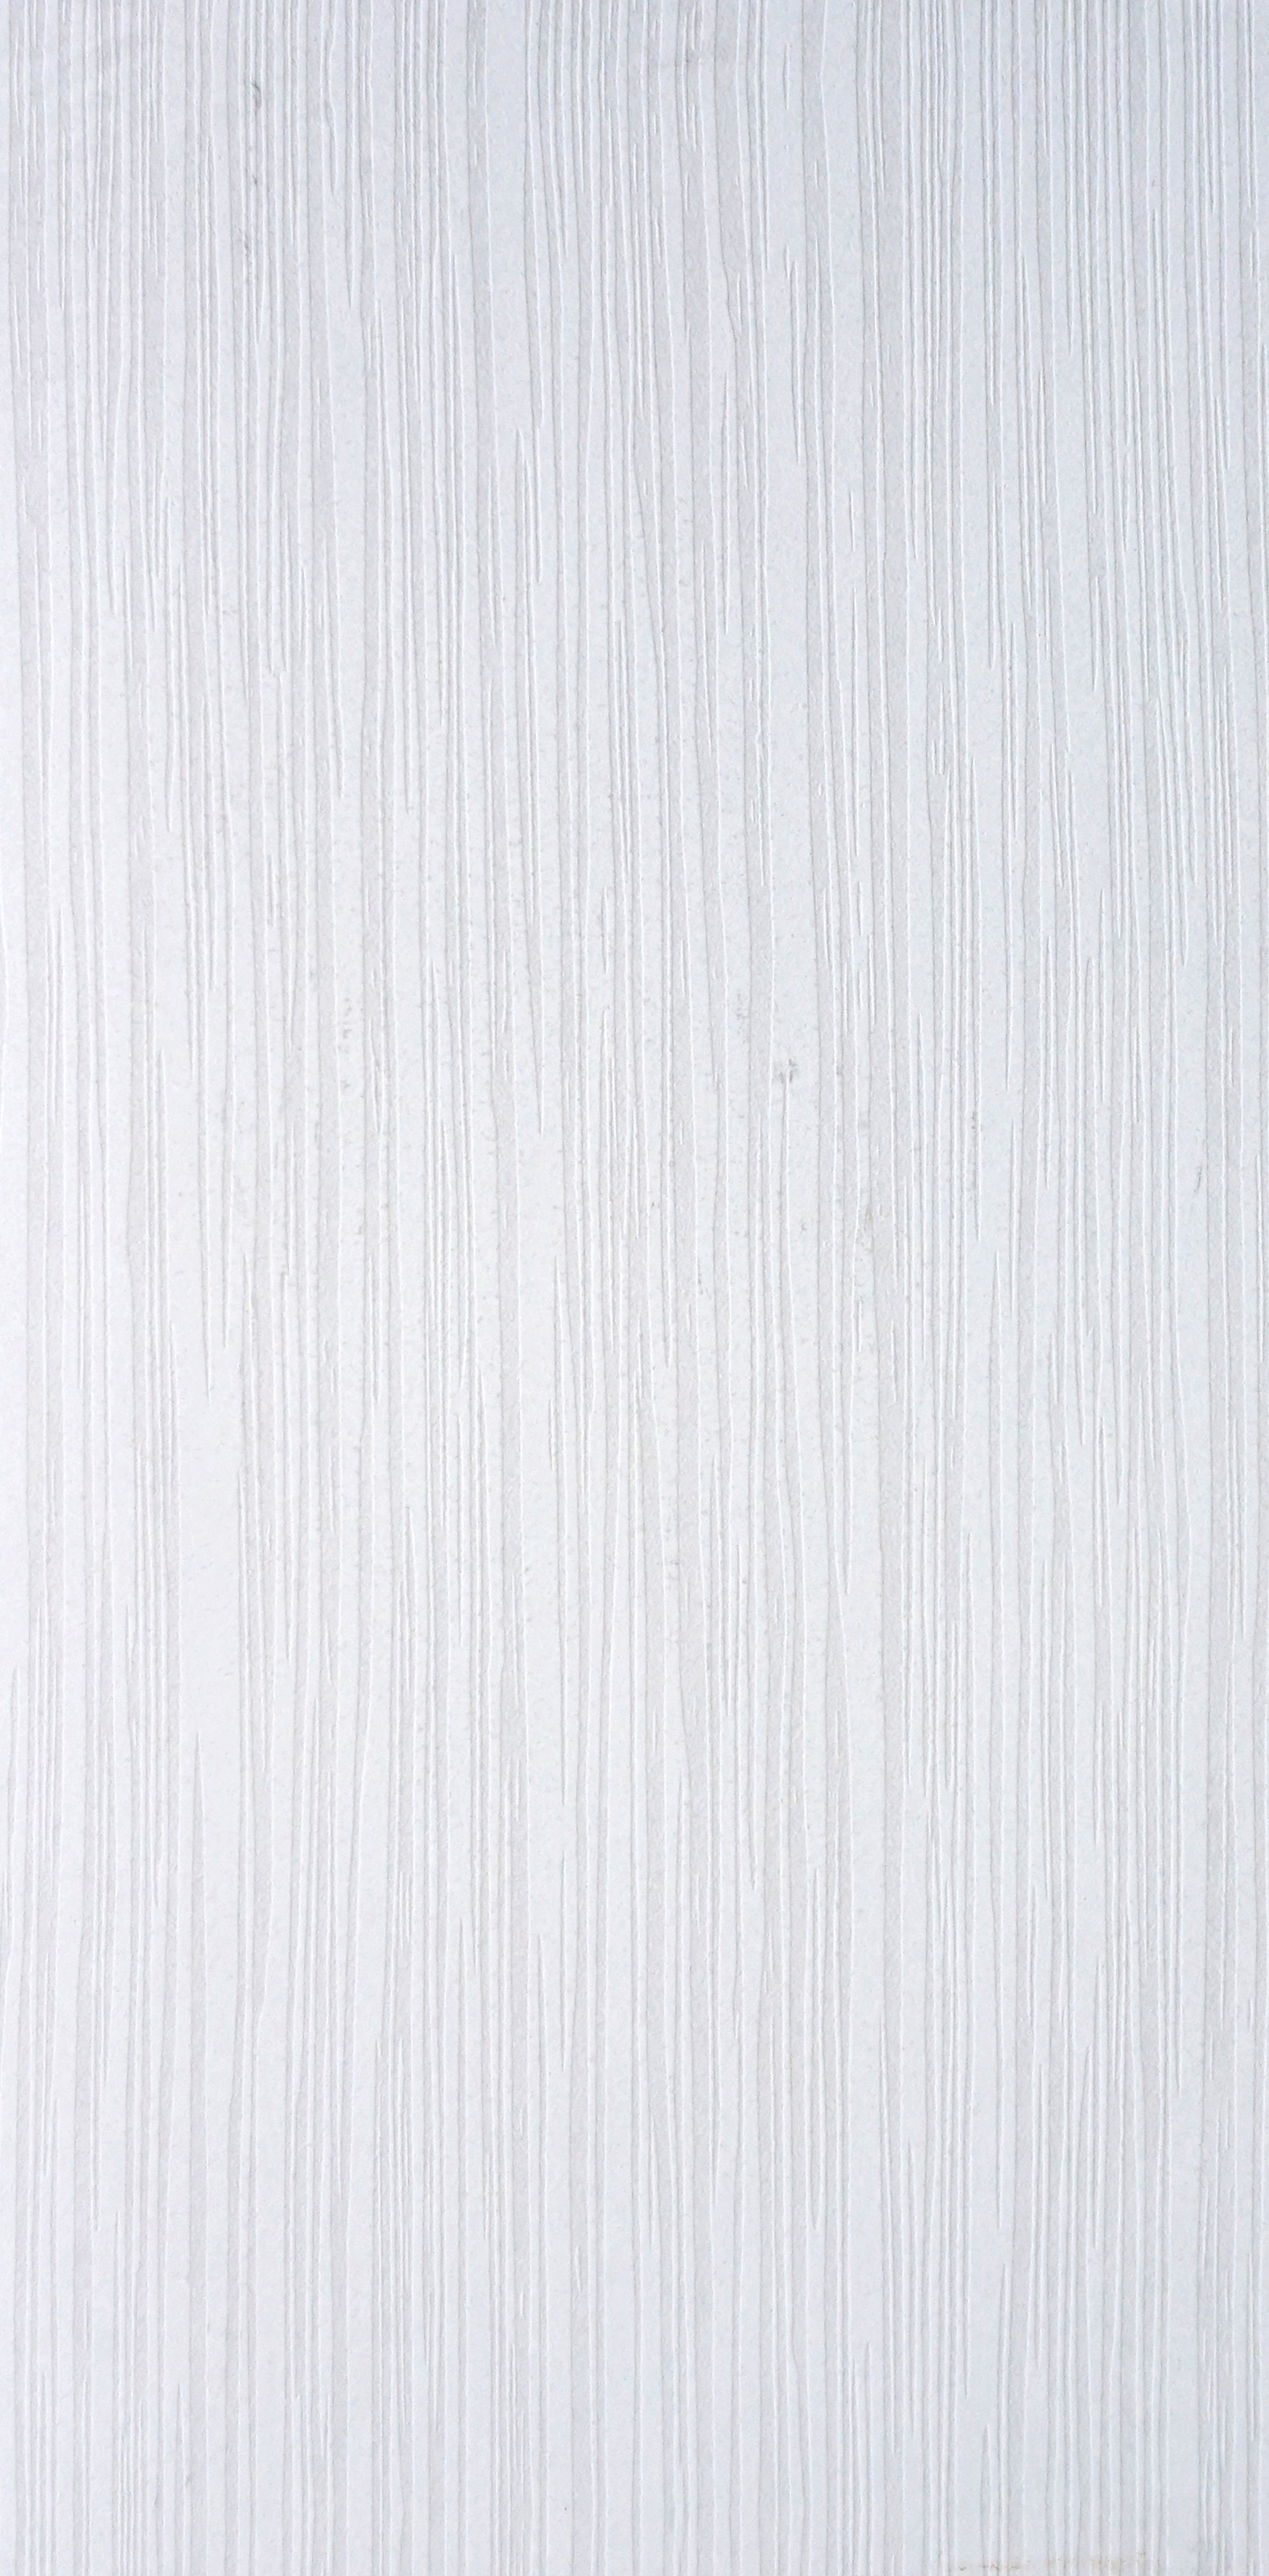 "CASCADE WHITE 12""X24"" -GLAZED PORCELAIN   8 PC/CTN (1  5.5 SF);  40 CTN/PLT"